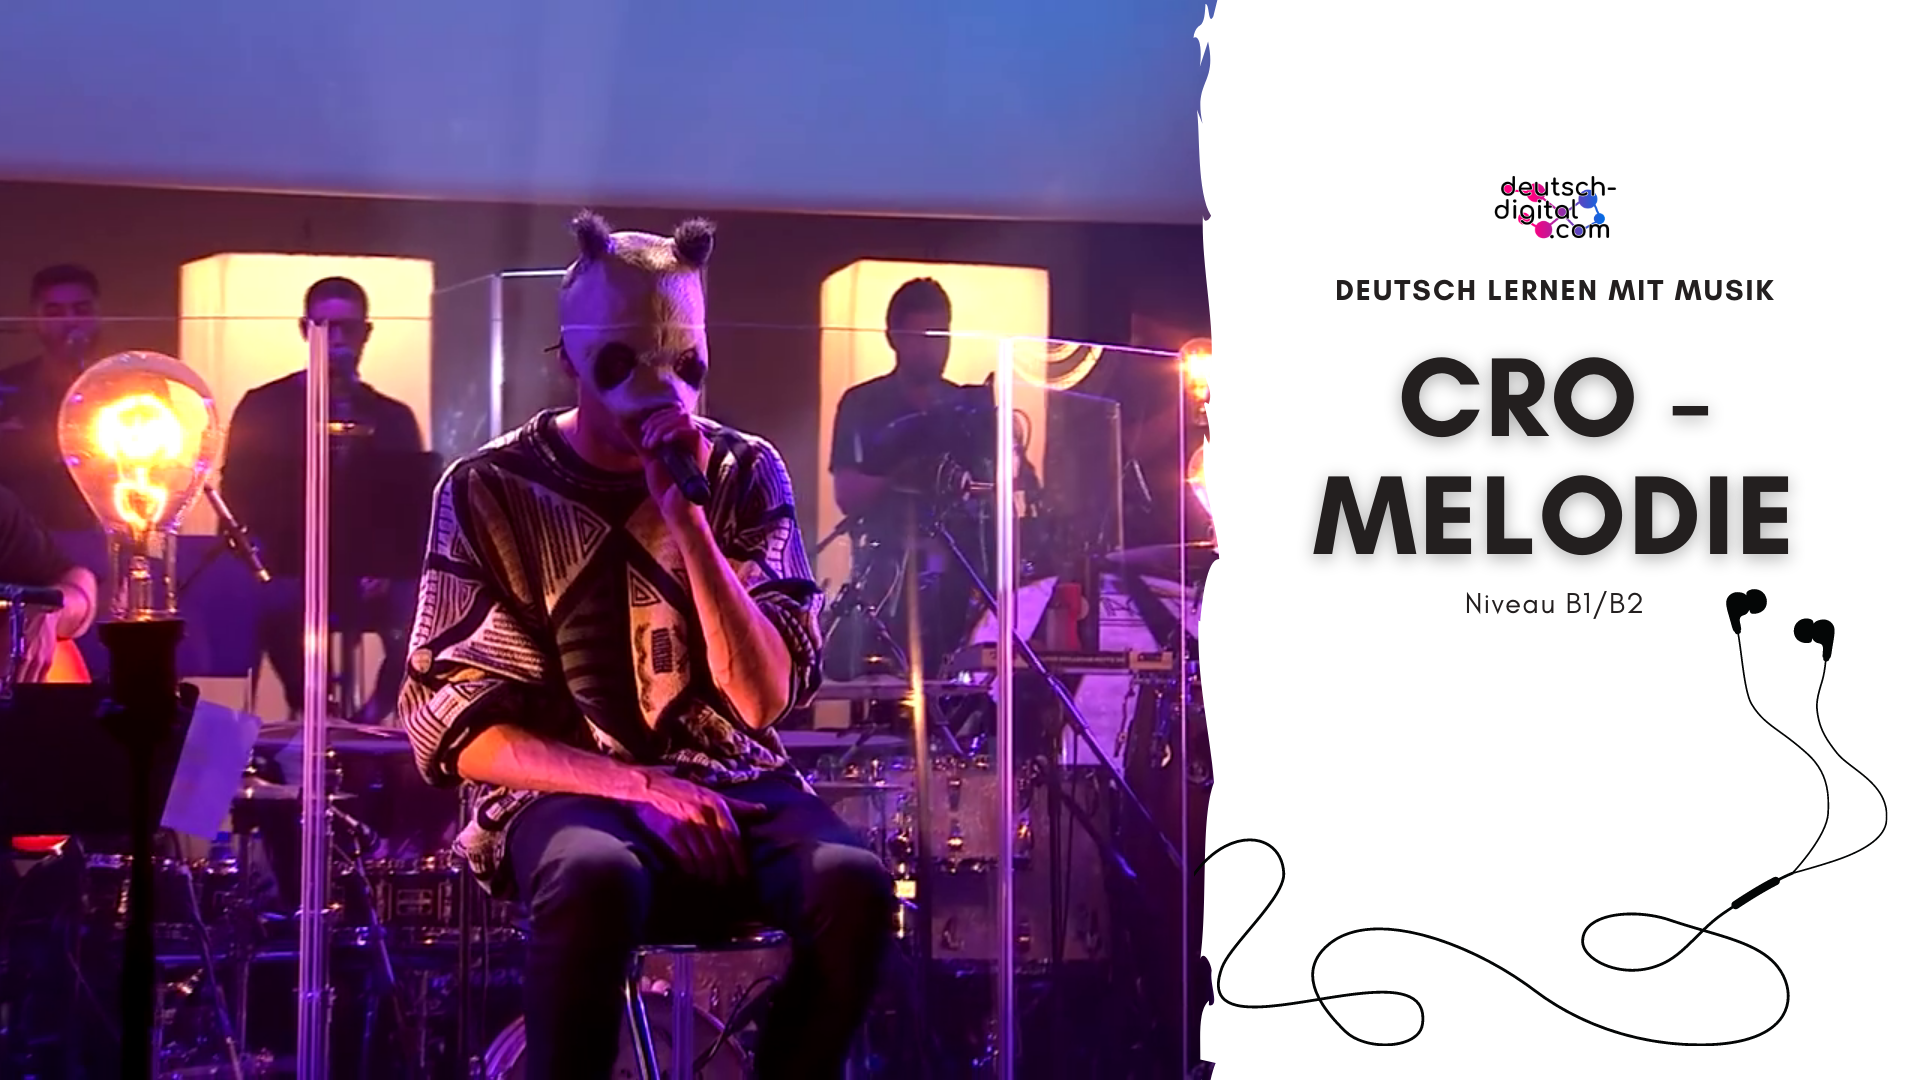 Melodie – Cro